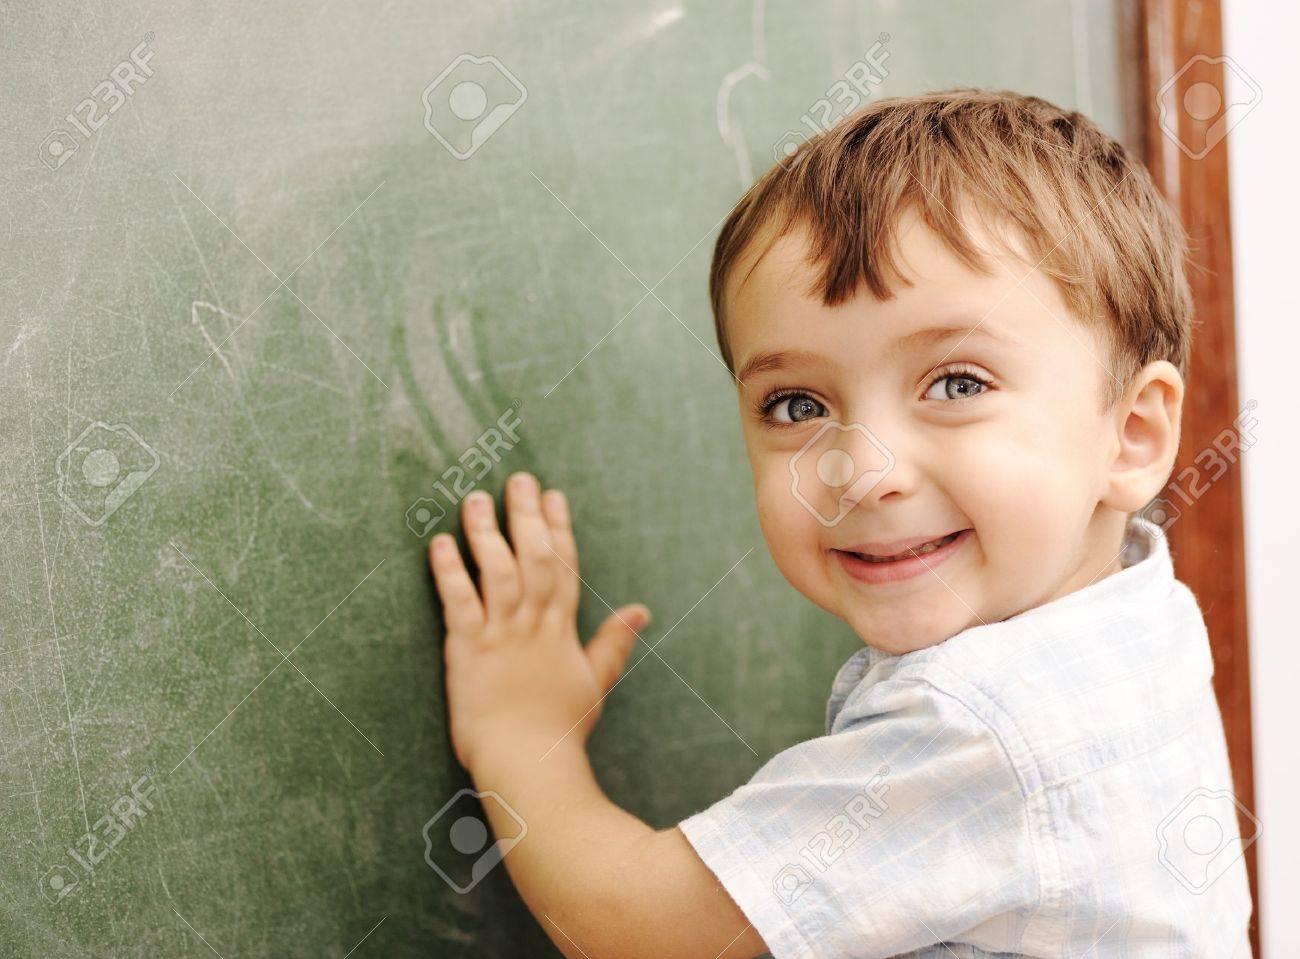 Children at school classroom Stock Photo - 14054015